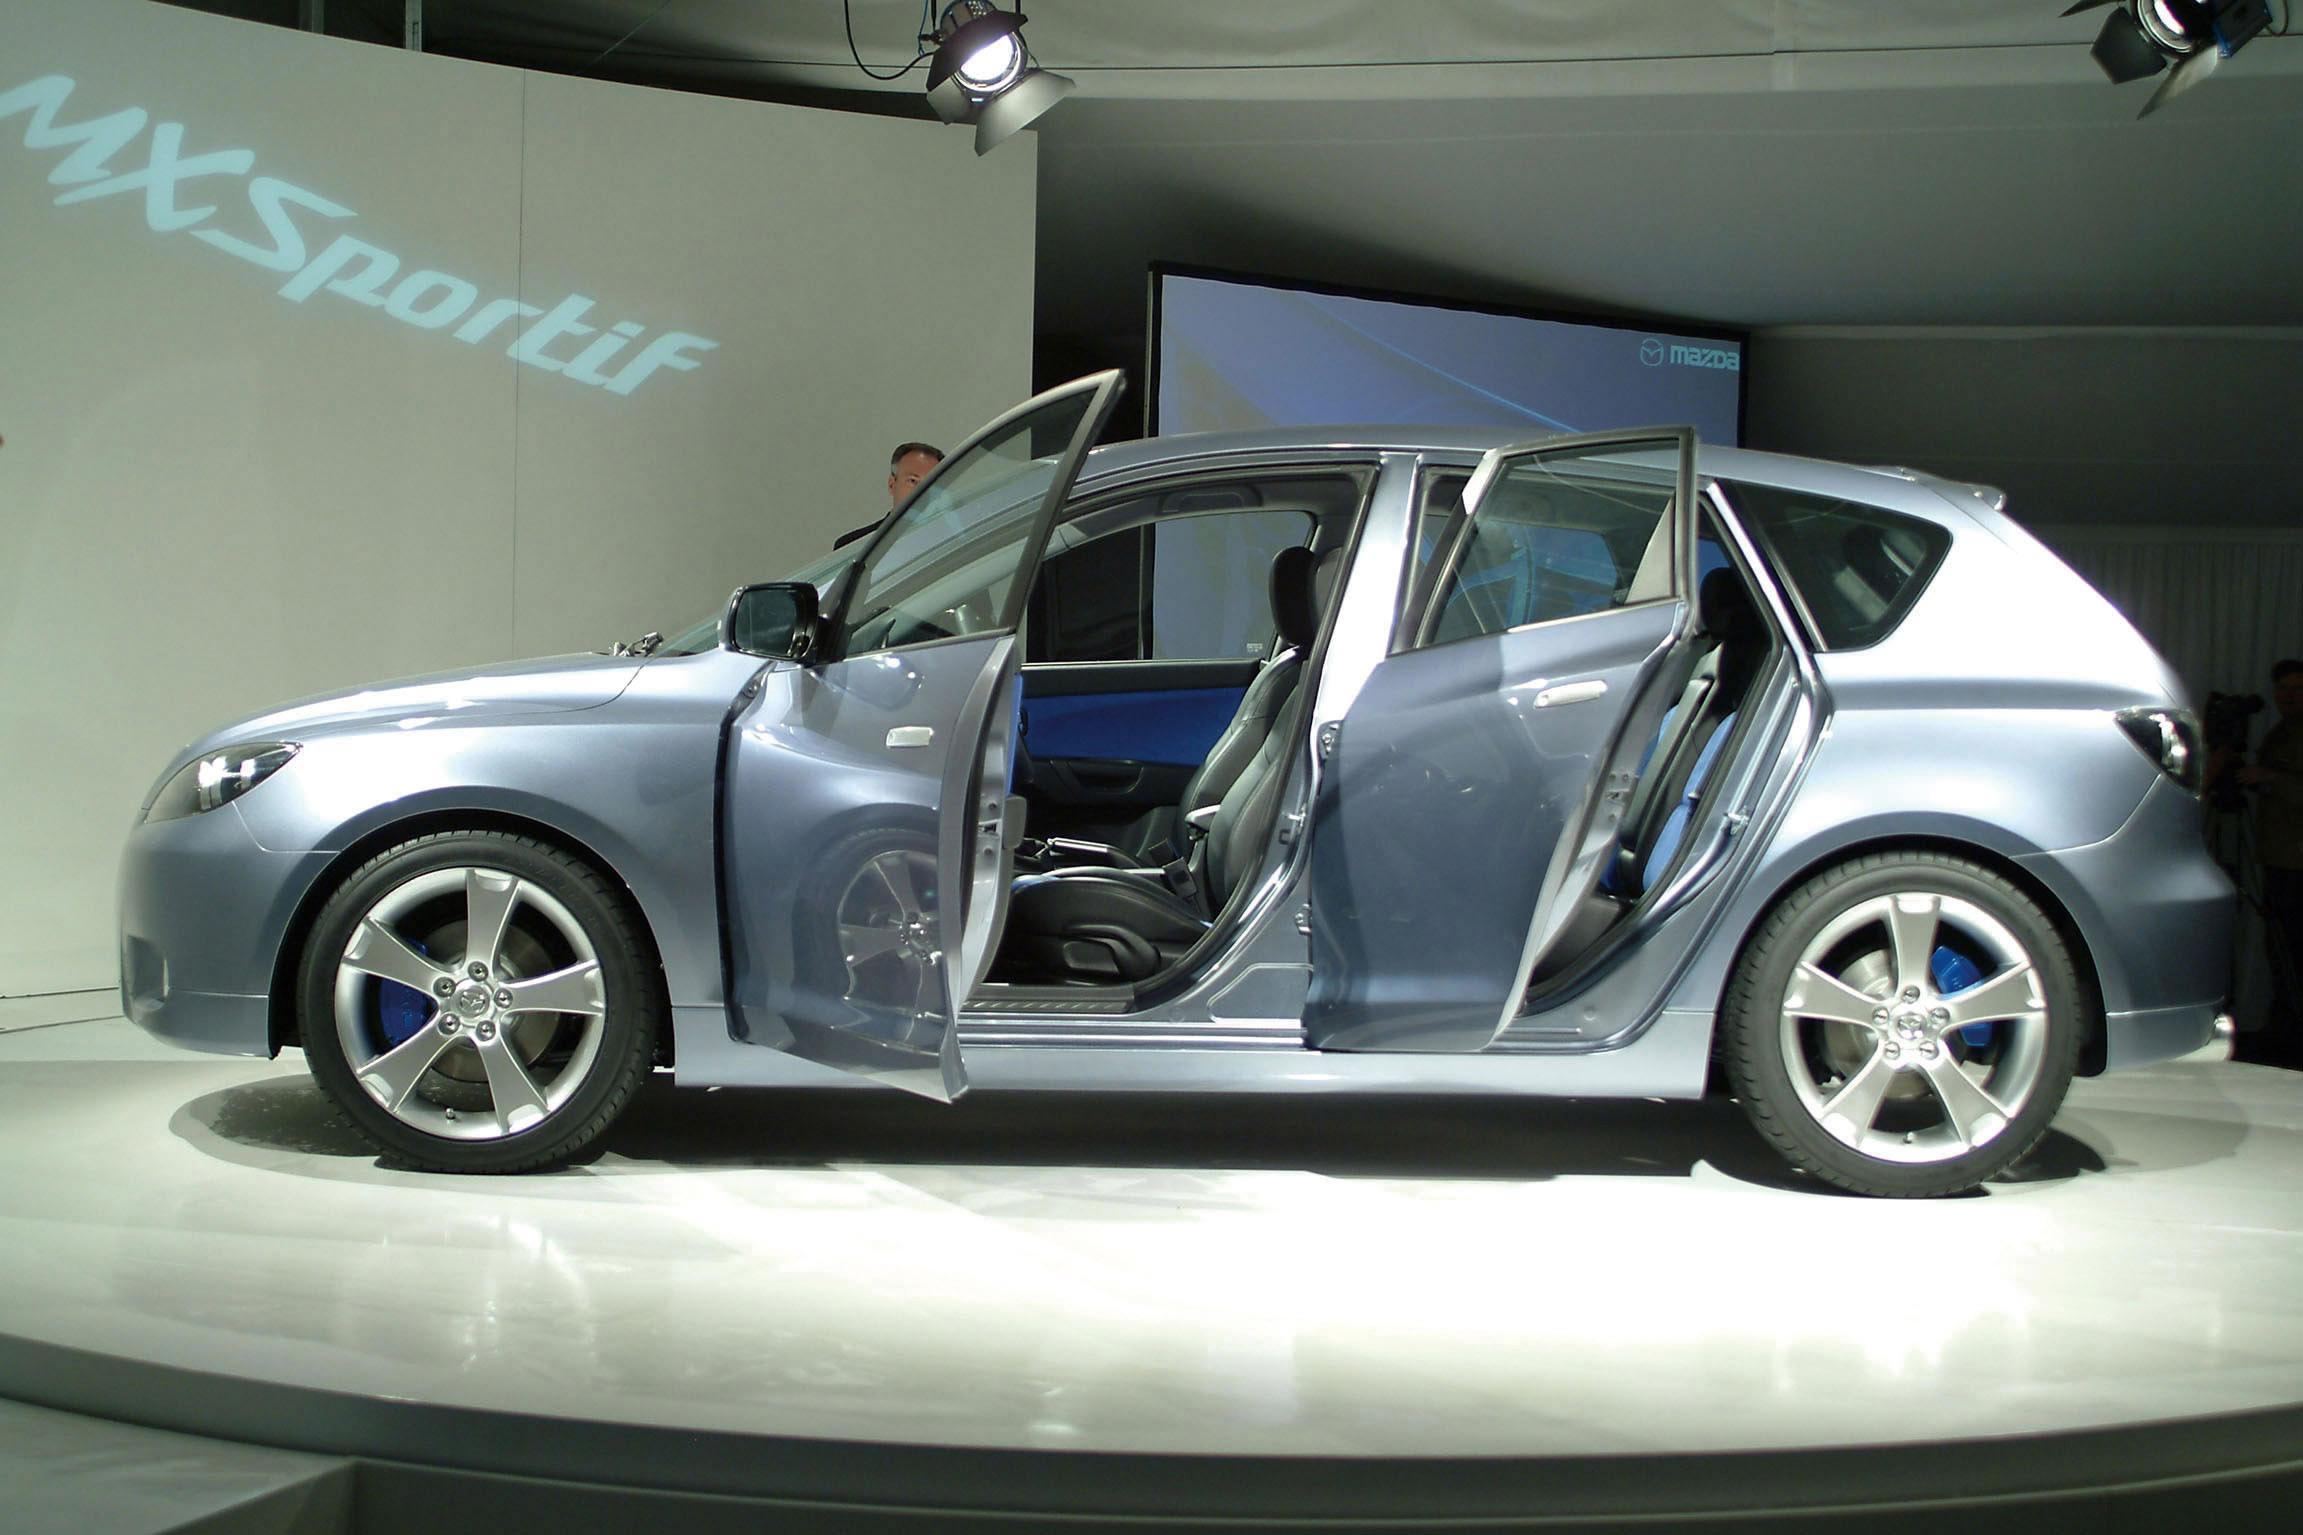 https://www.automobilesreview.com/gallery/2003-mazda-mx-sportif-concept/2003-mazda-mx-sportif-concept-24.jpg